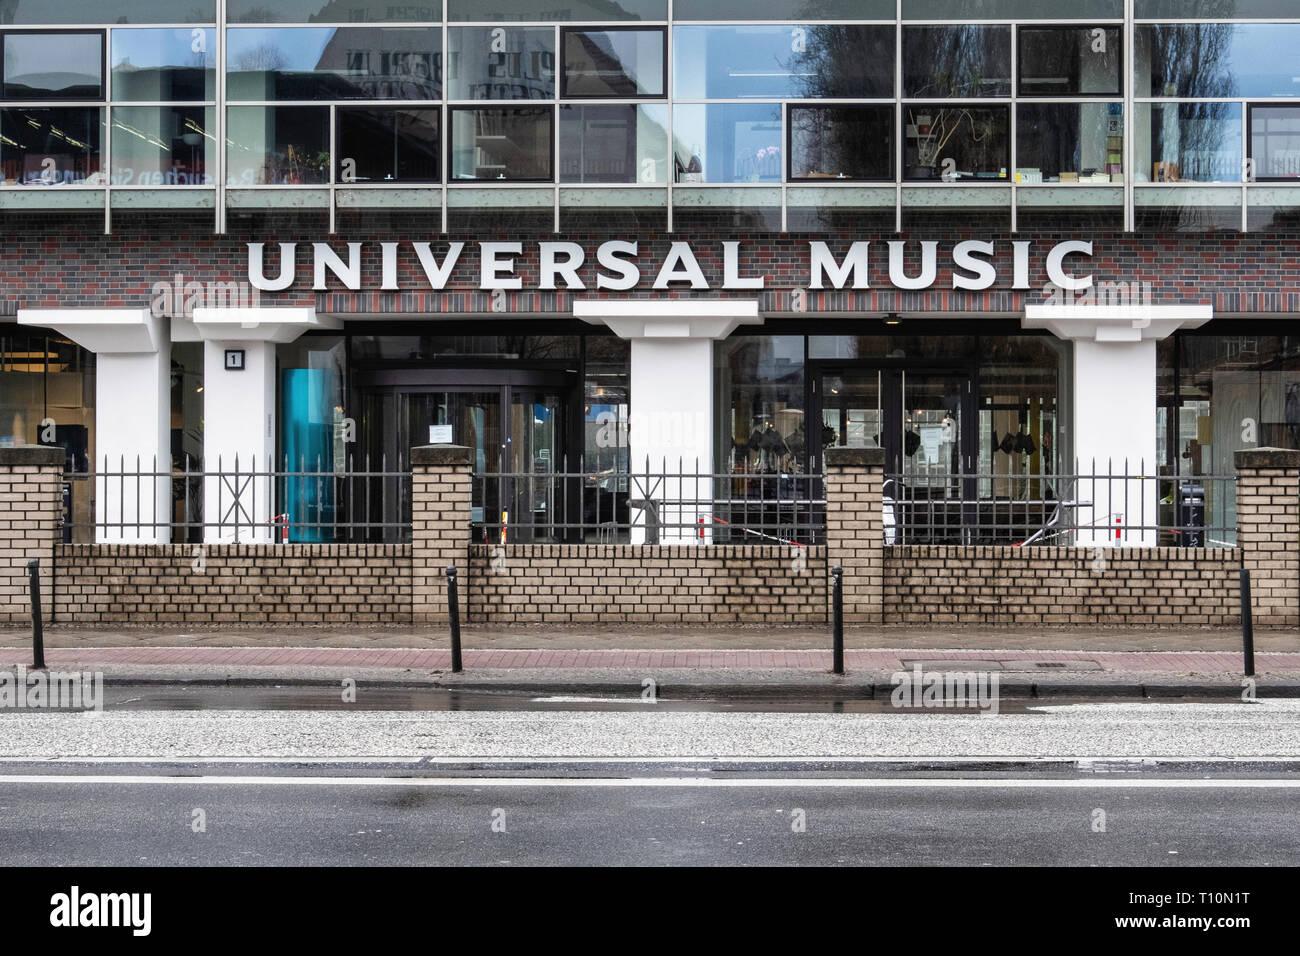 Berlin-Friedrichshain. Universal Music GmbH in a former egg cold-storage warehouse designed by Oskar Pusch 1928-9. German subsidiary of Universal Musi Stock Photo